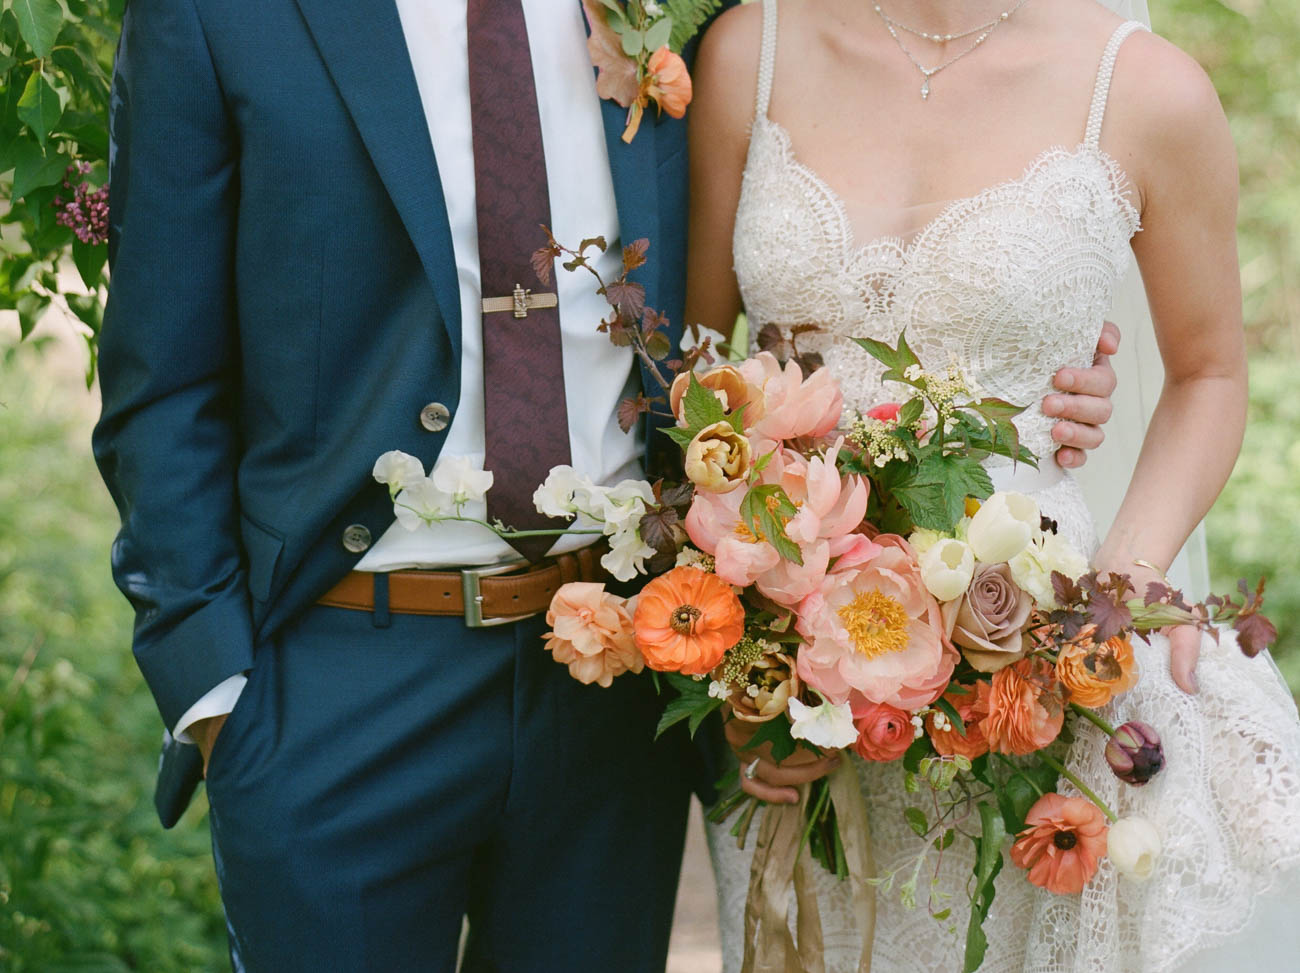 kateweinsteinphoto_schlitz_audubon_milwaukee_wedding-139 (1).jpg